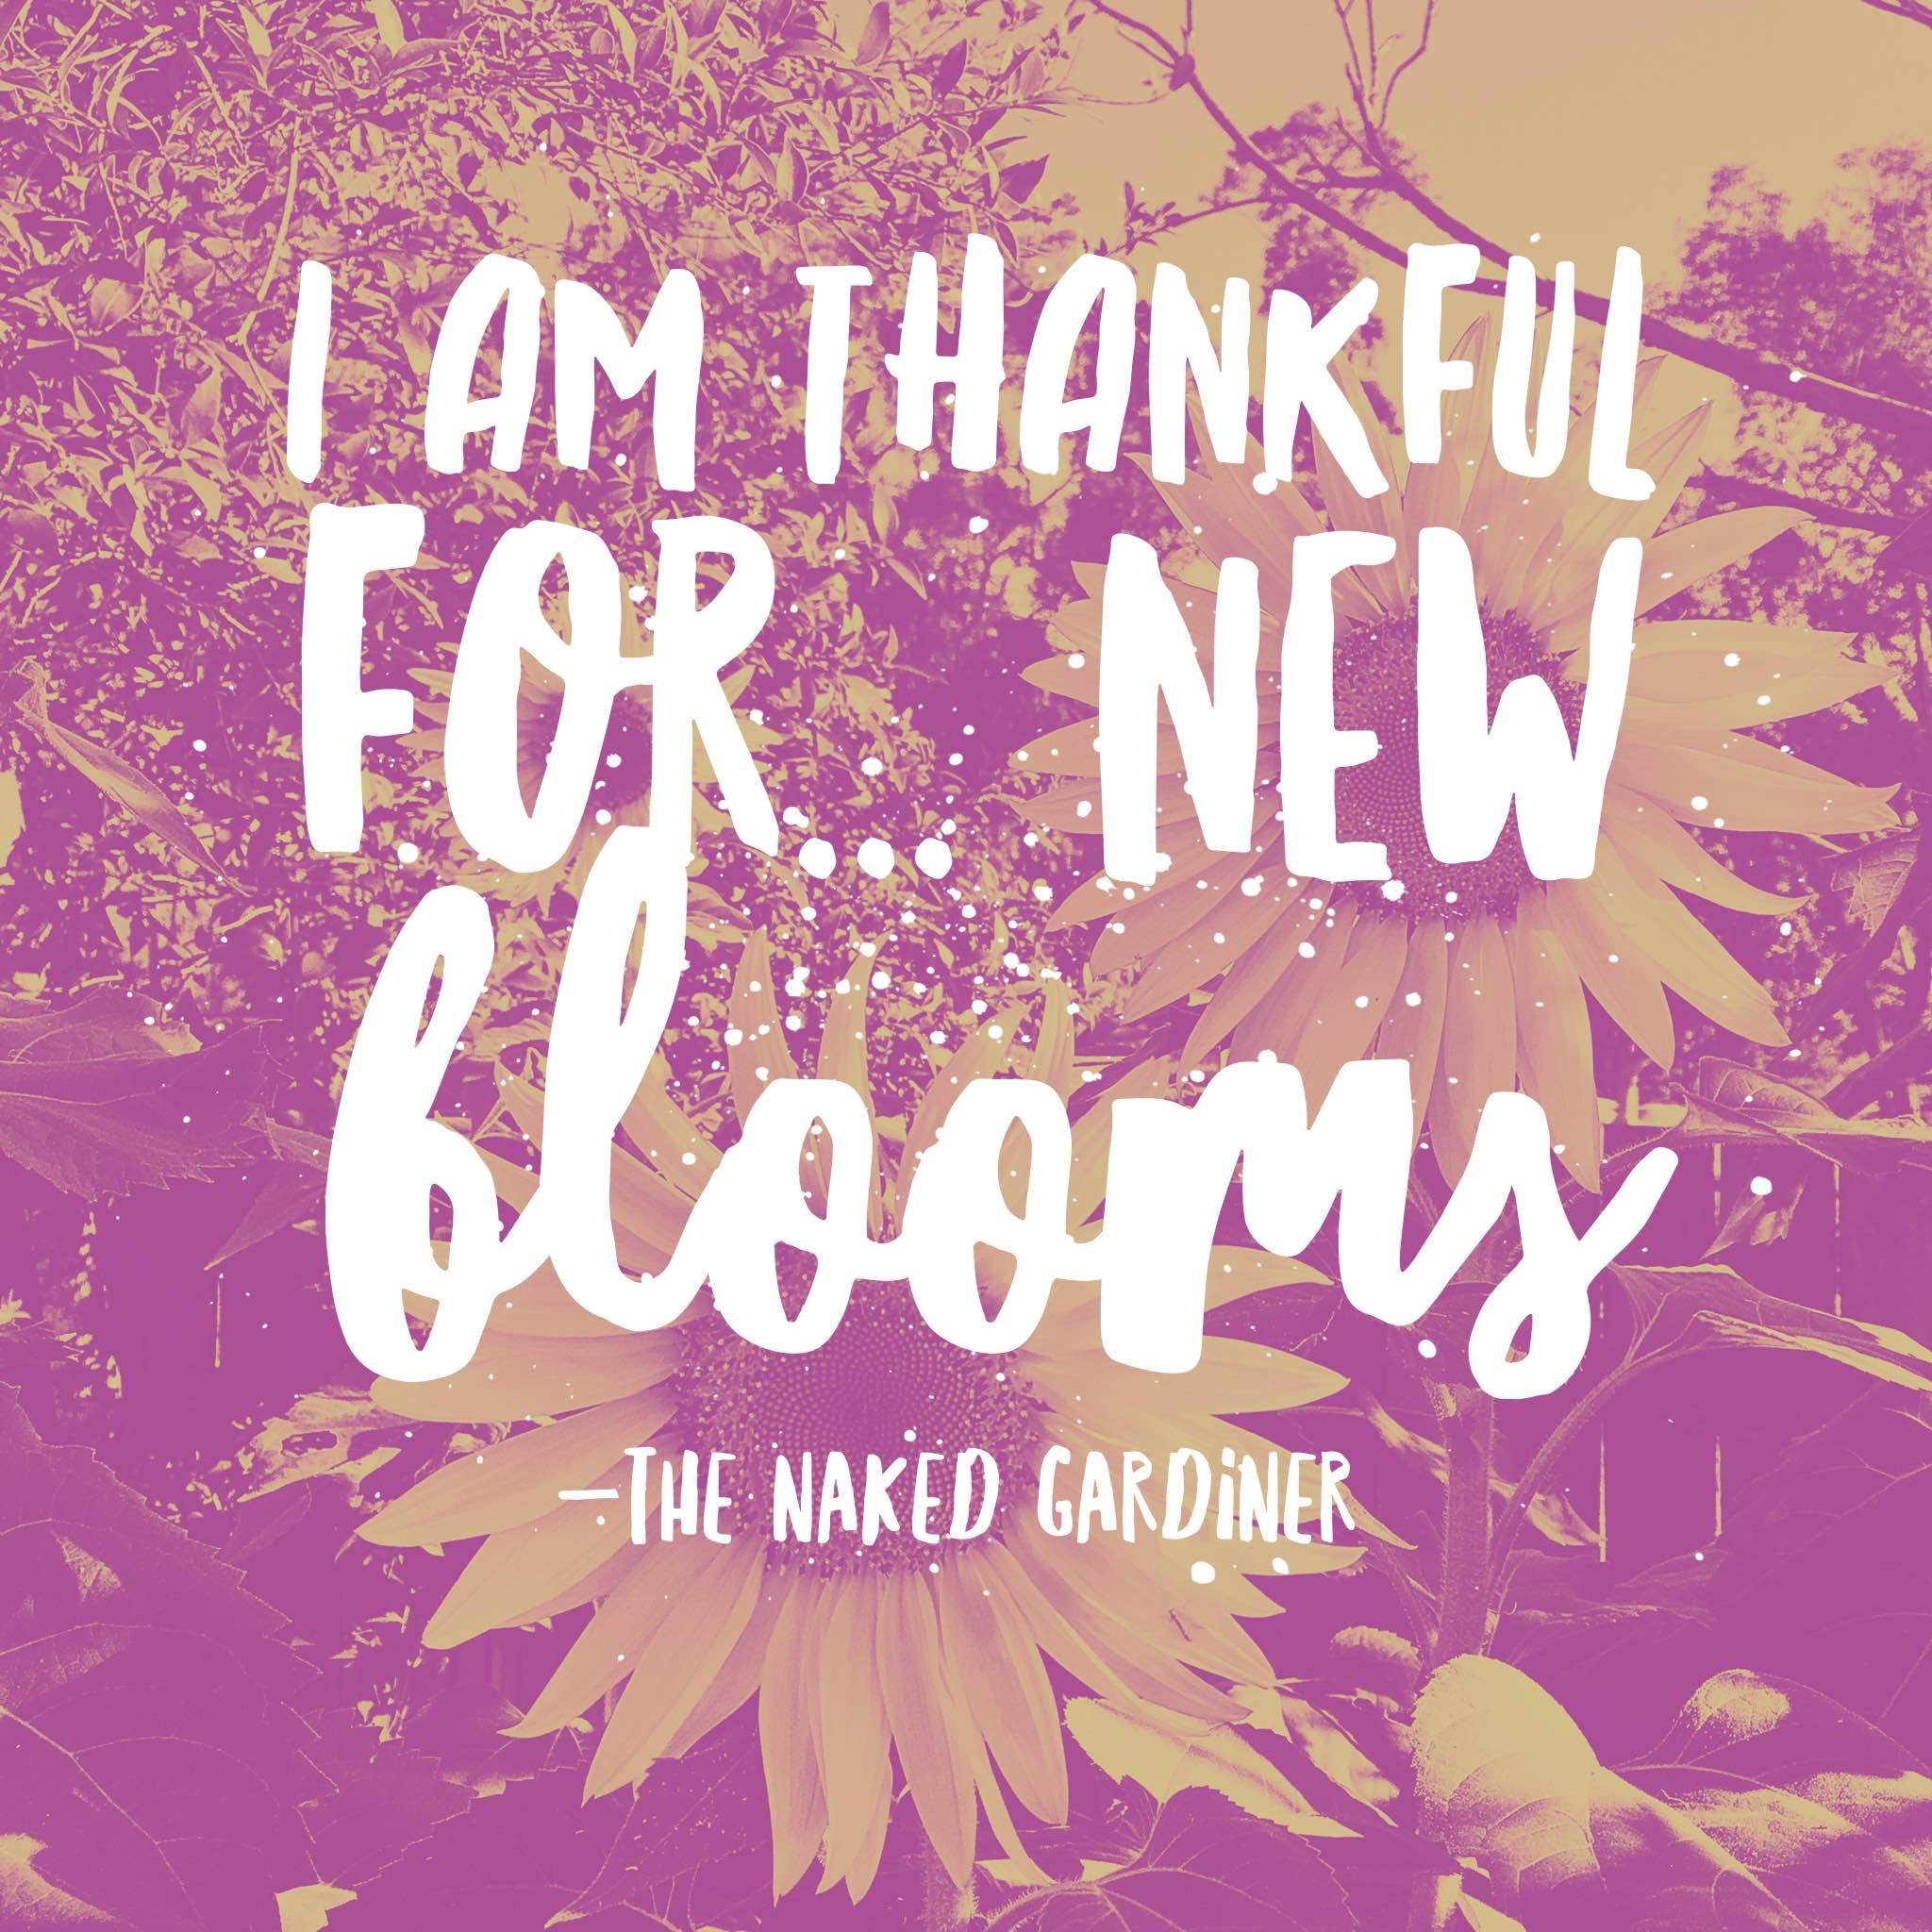 thankful-thursdays-new-blooms-the-naked-gardiner-kathy-gardiner